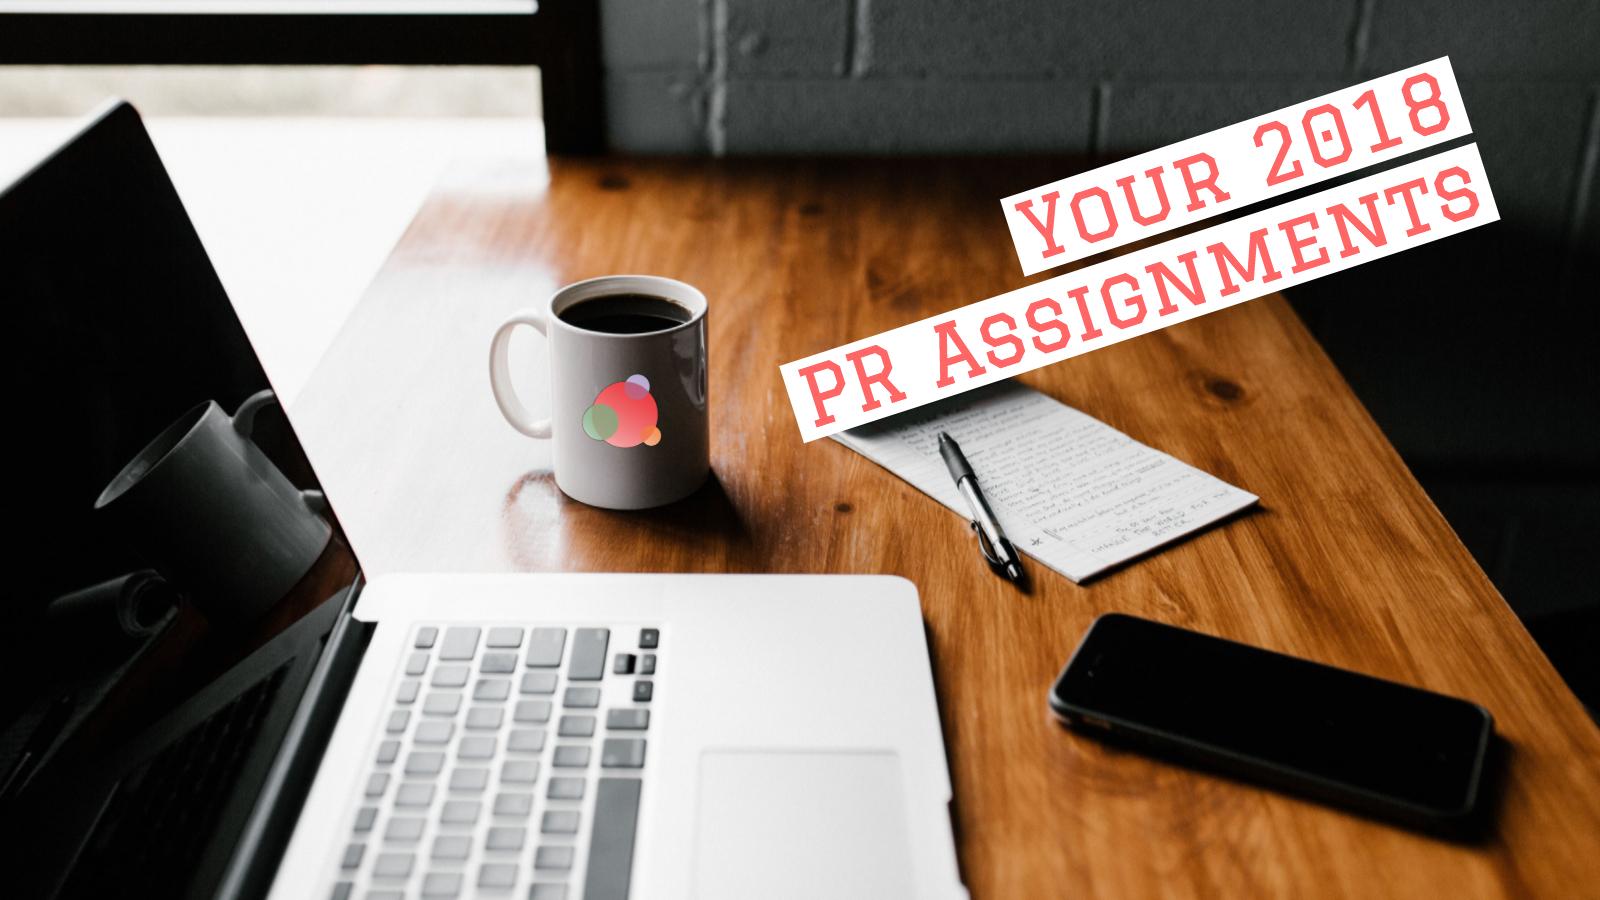 PR Assignments